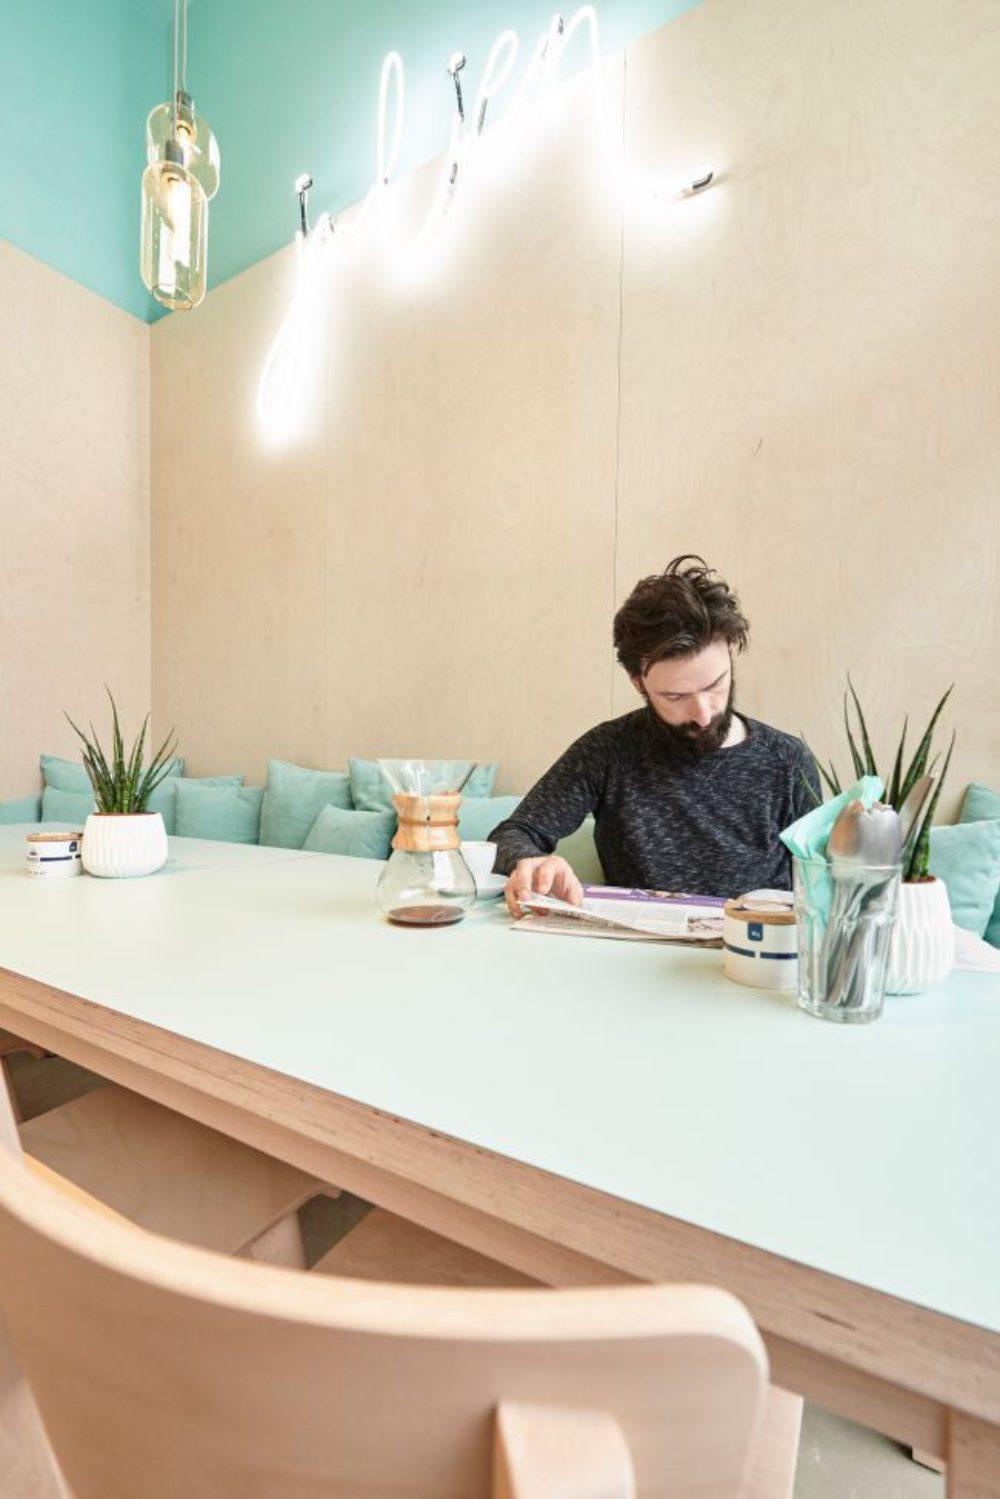 Bar julien roeselare klant tafel af16789 thumb